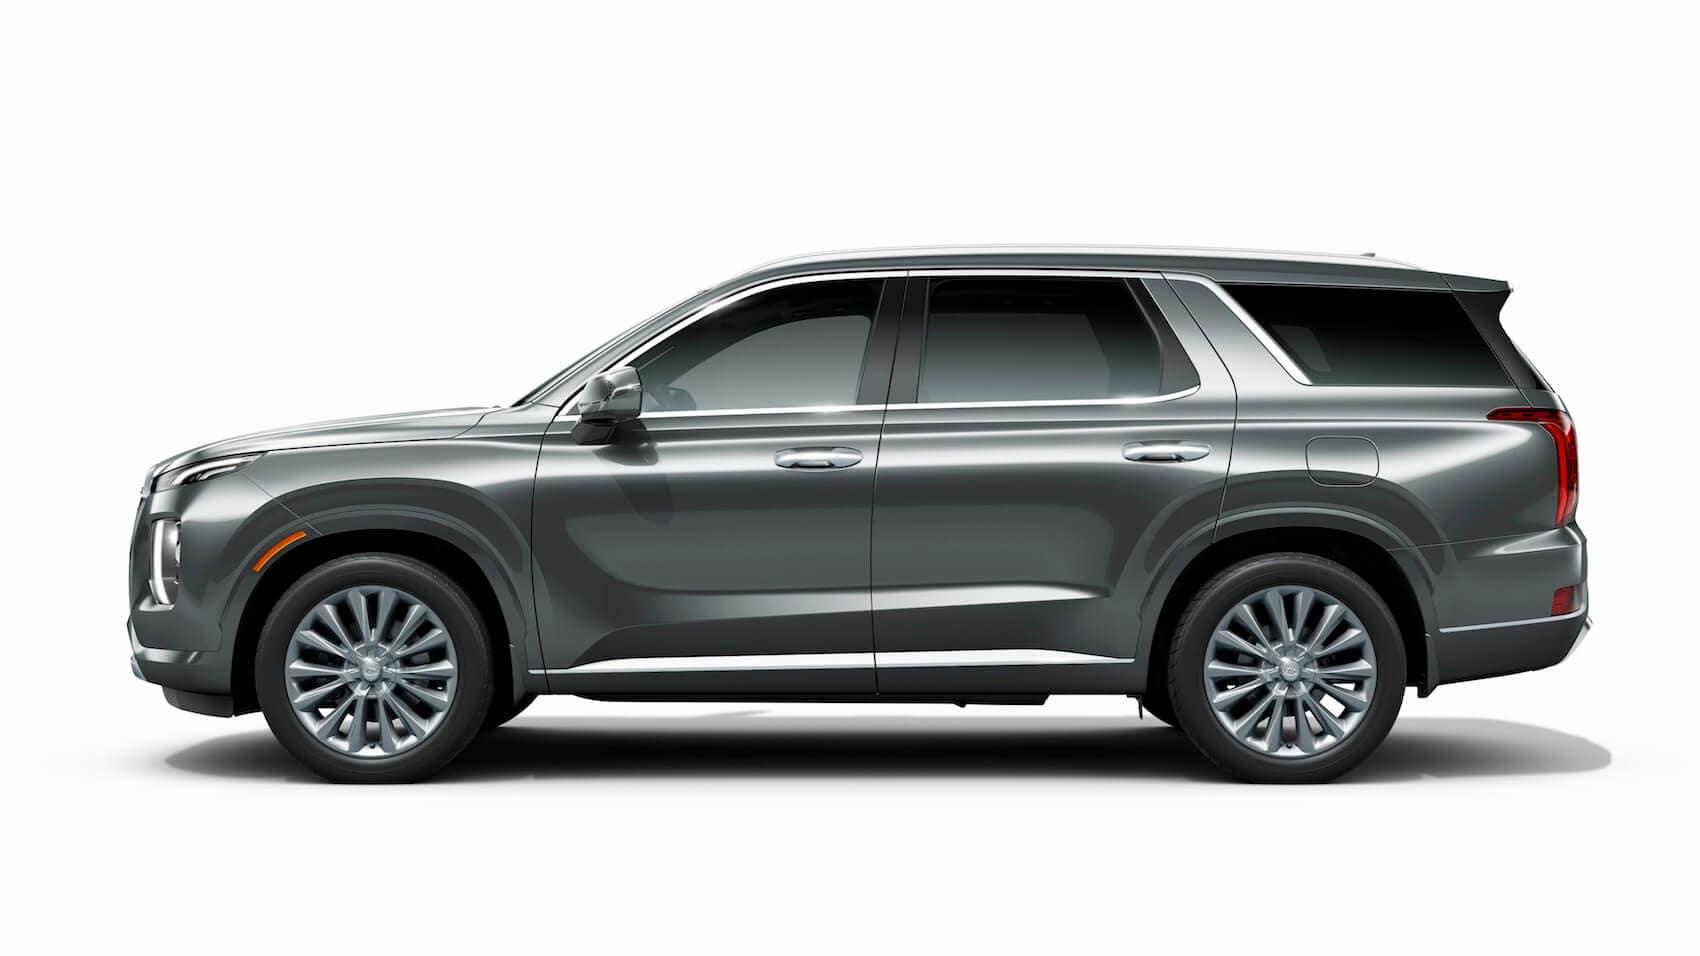 2020 Hyundai Palisade limited trim Littleton, CO